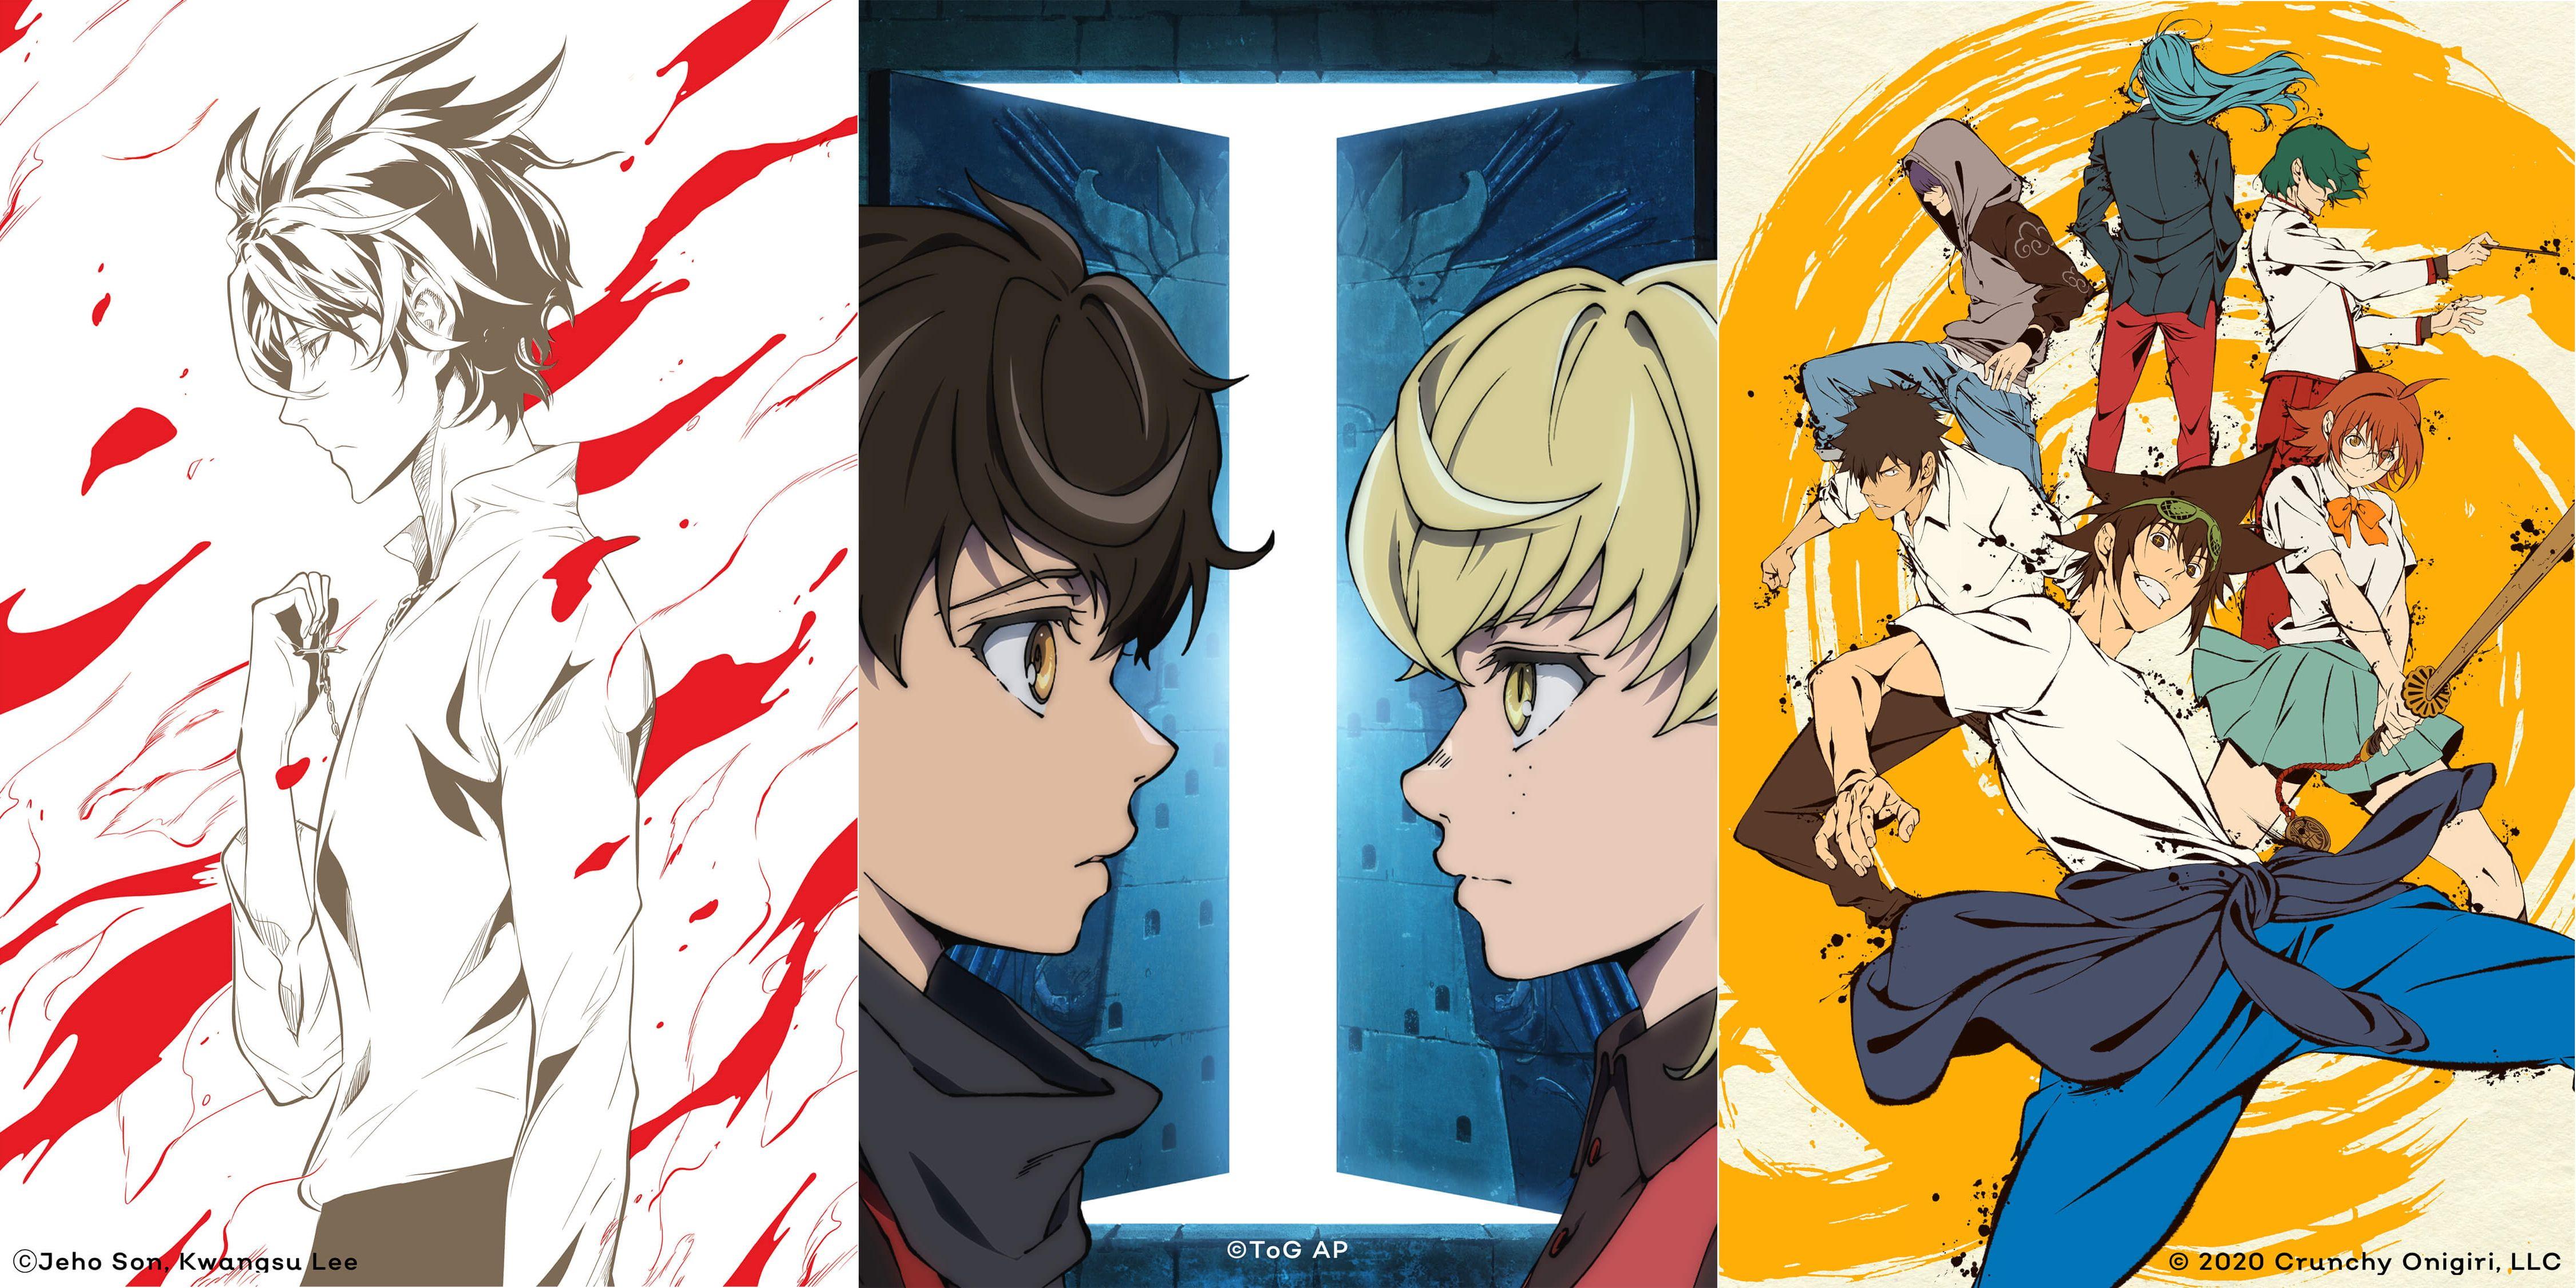 What Webtoon's Big 3 Are (& Their Shonen Manga Equivalents)